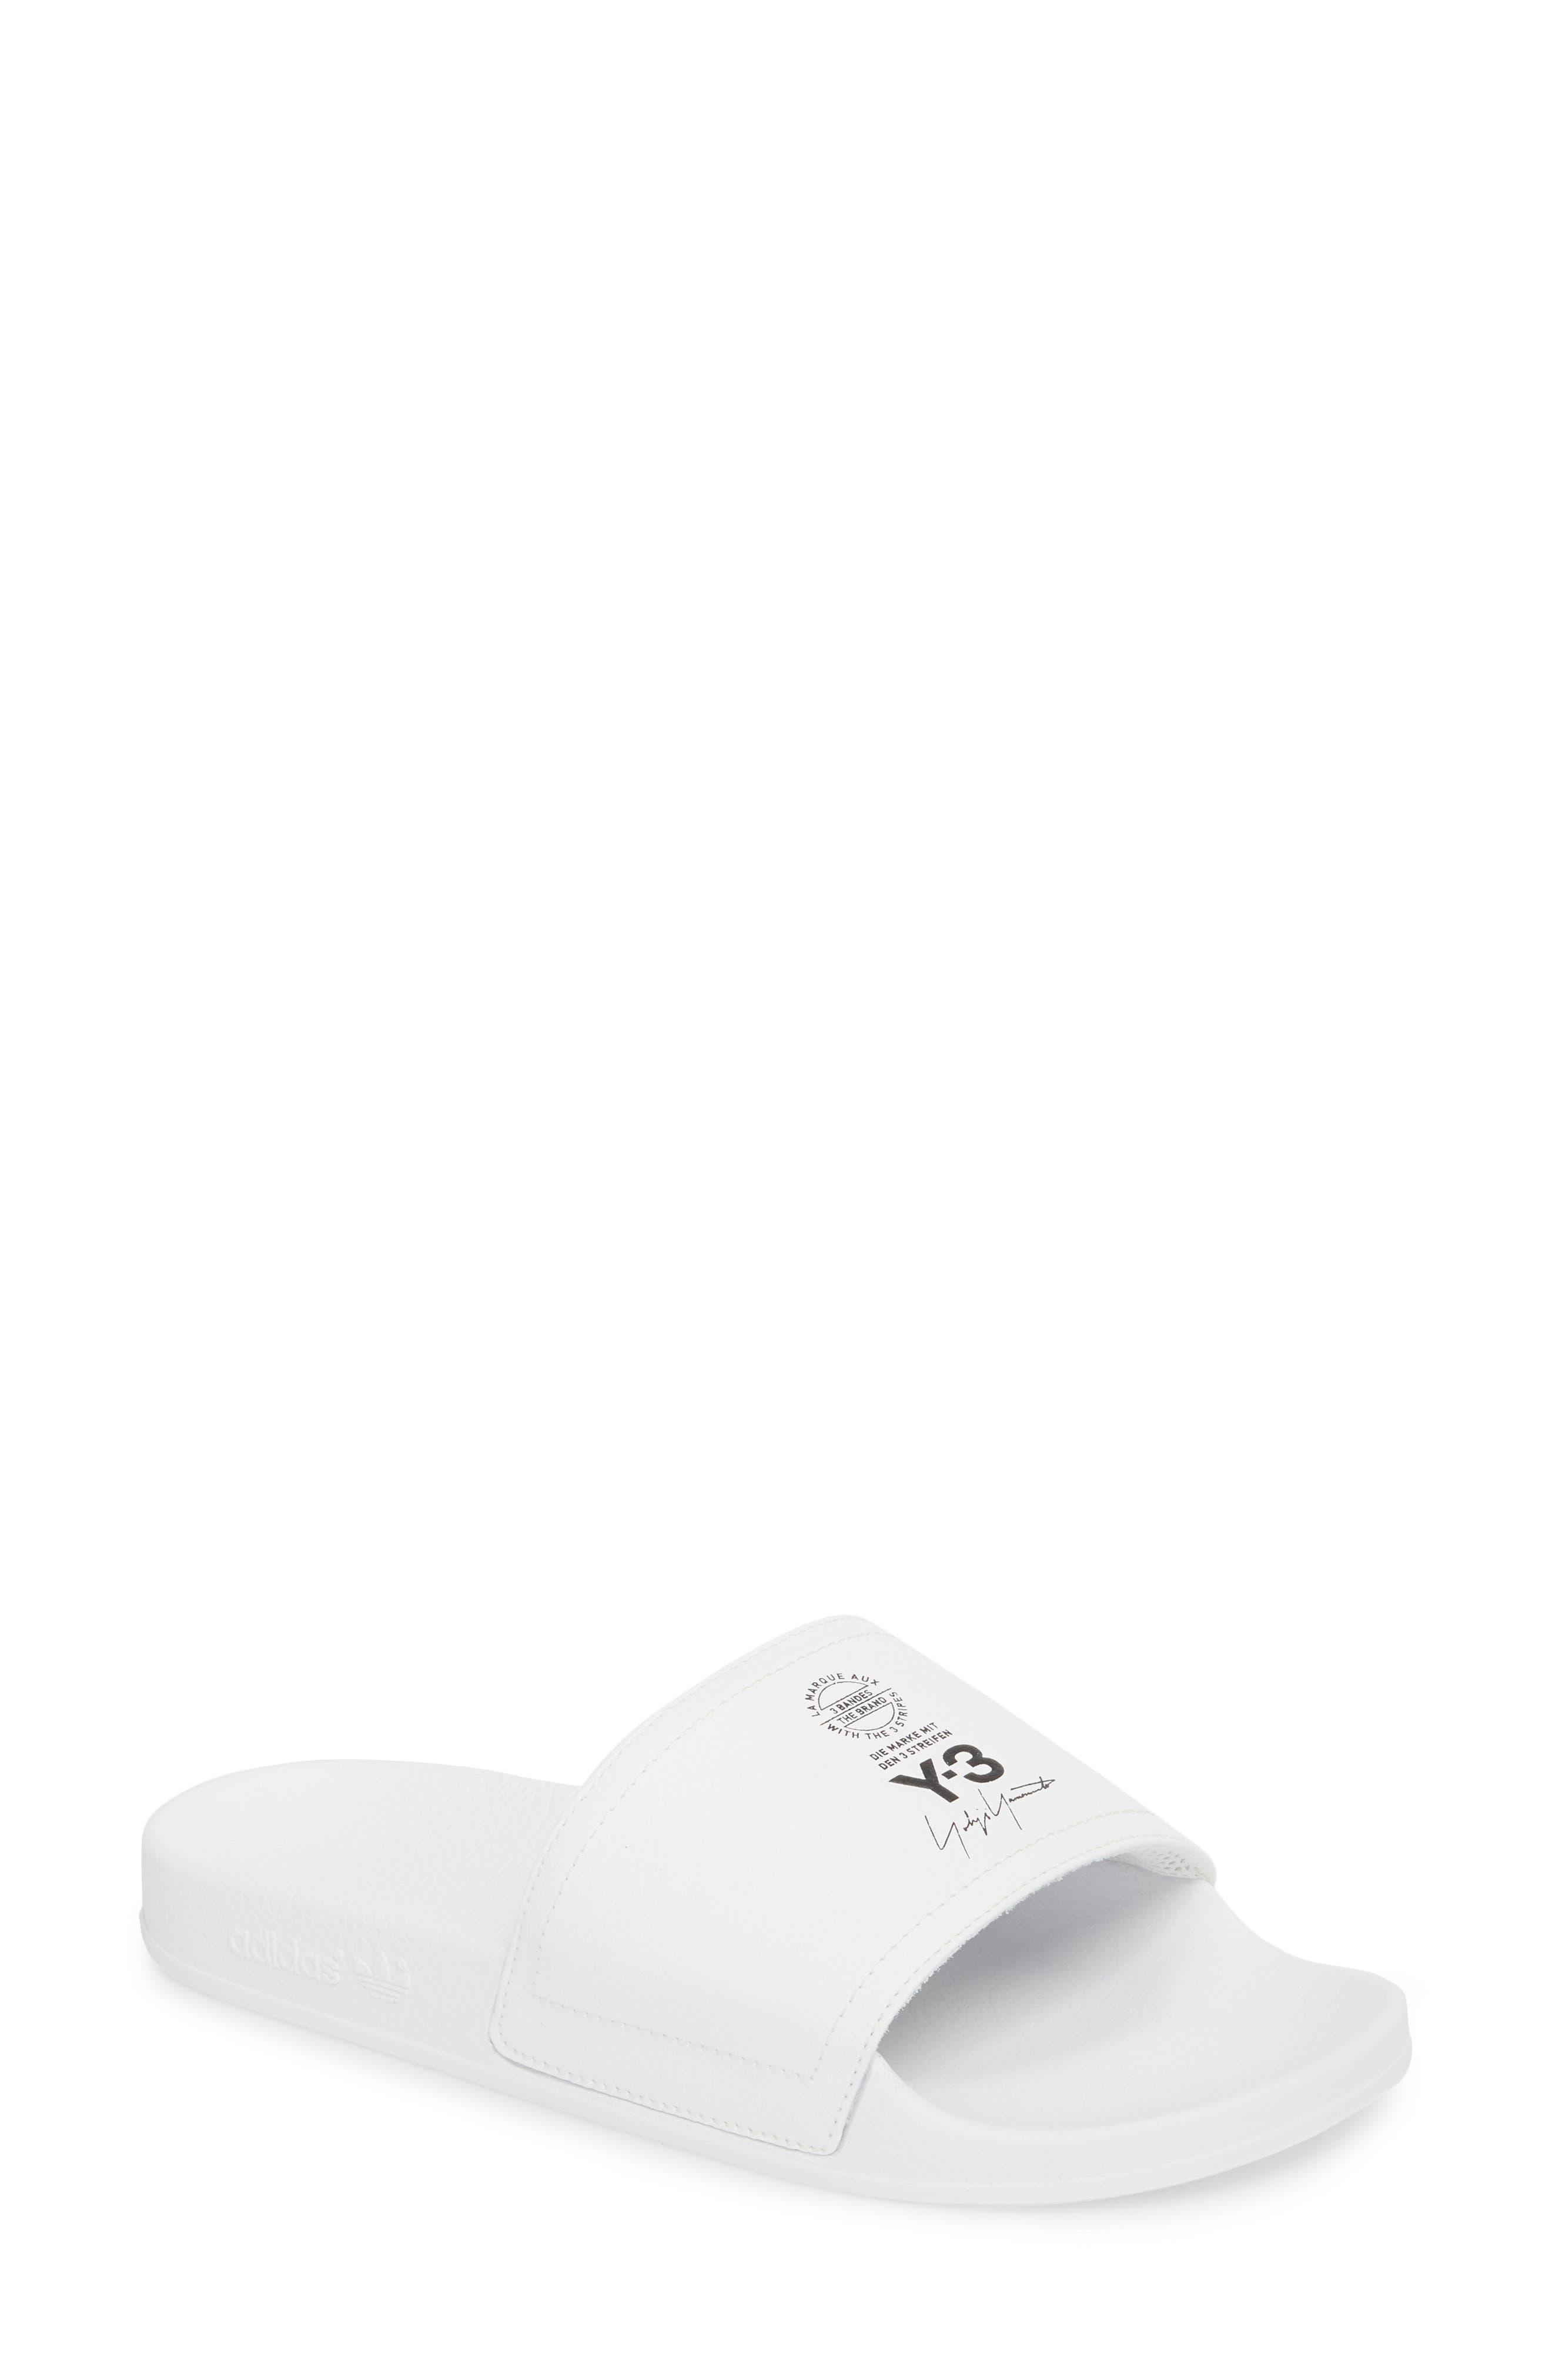 Y-3 x adidas Adilette Slide Sandal (Women)